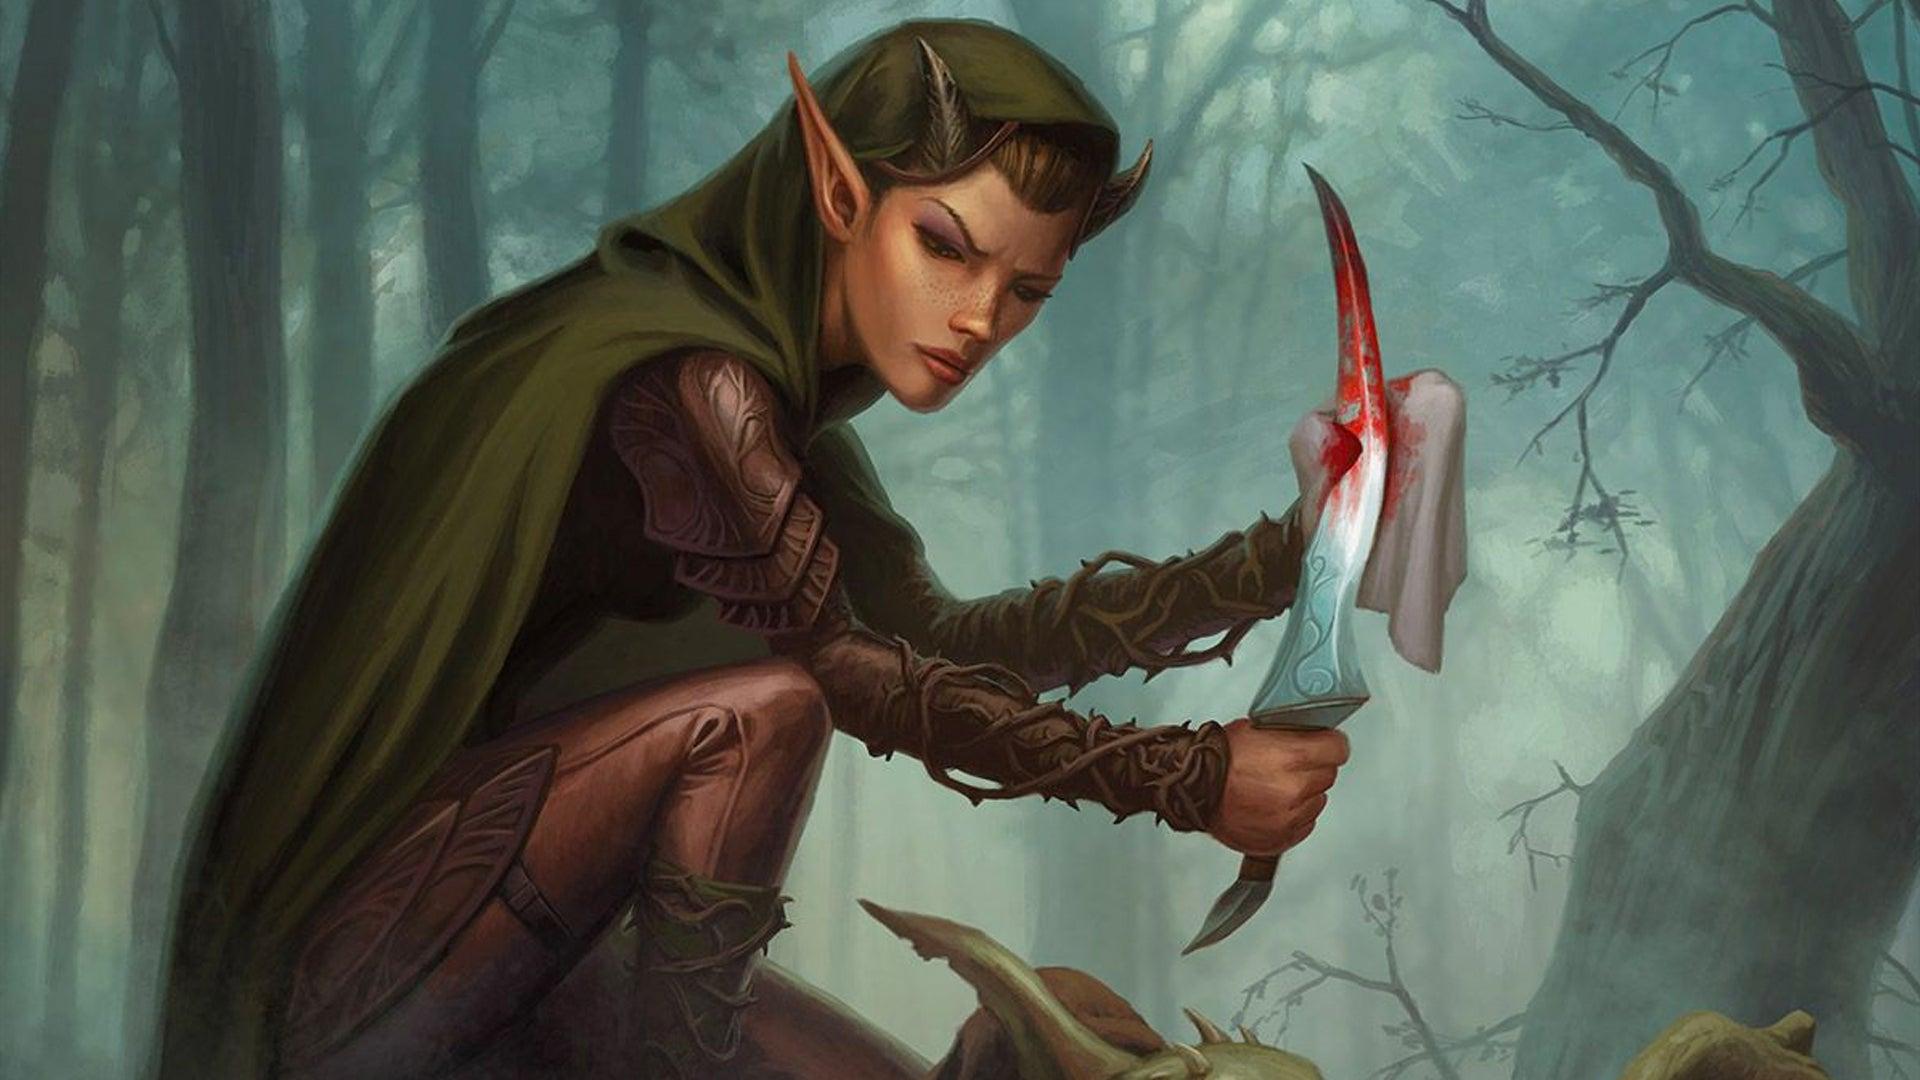 Magic: The Gathering Eyeblight Assassin card artwork